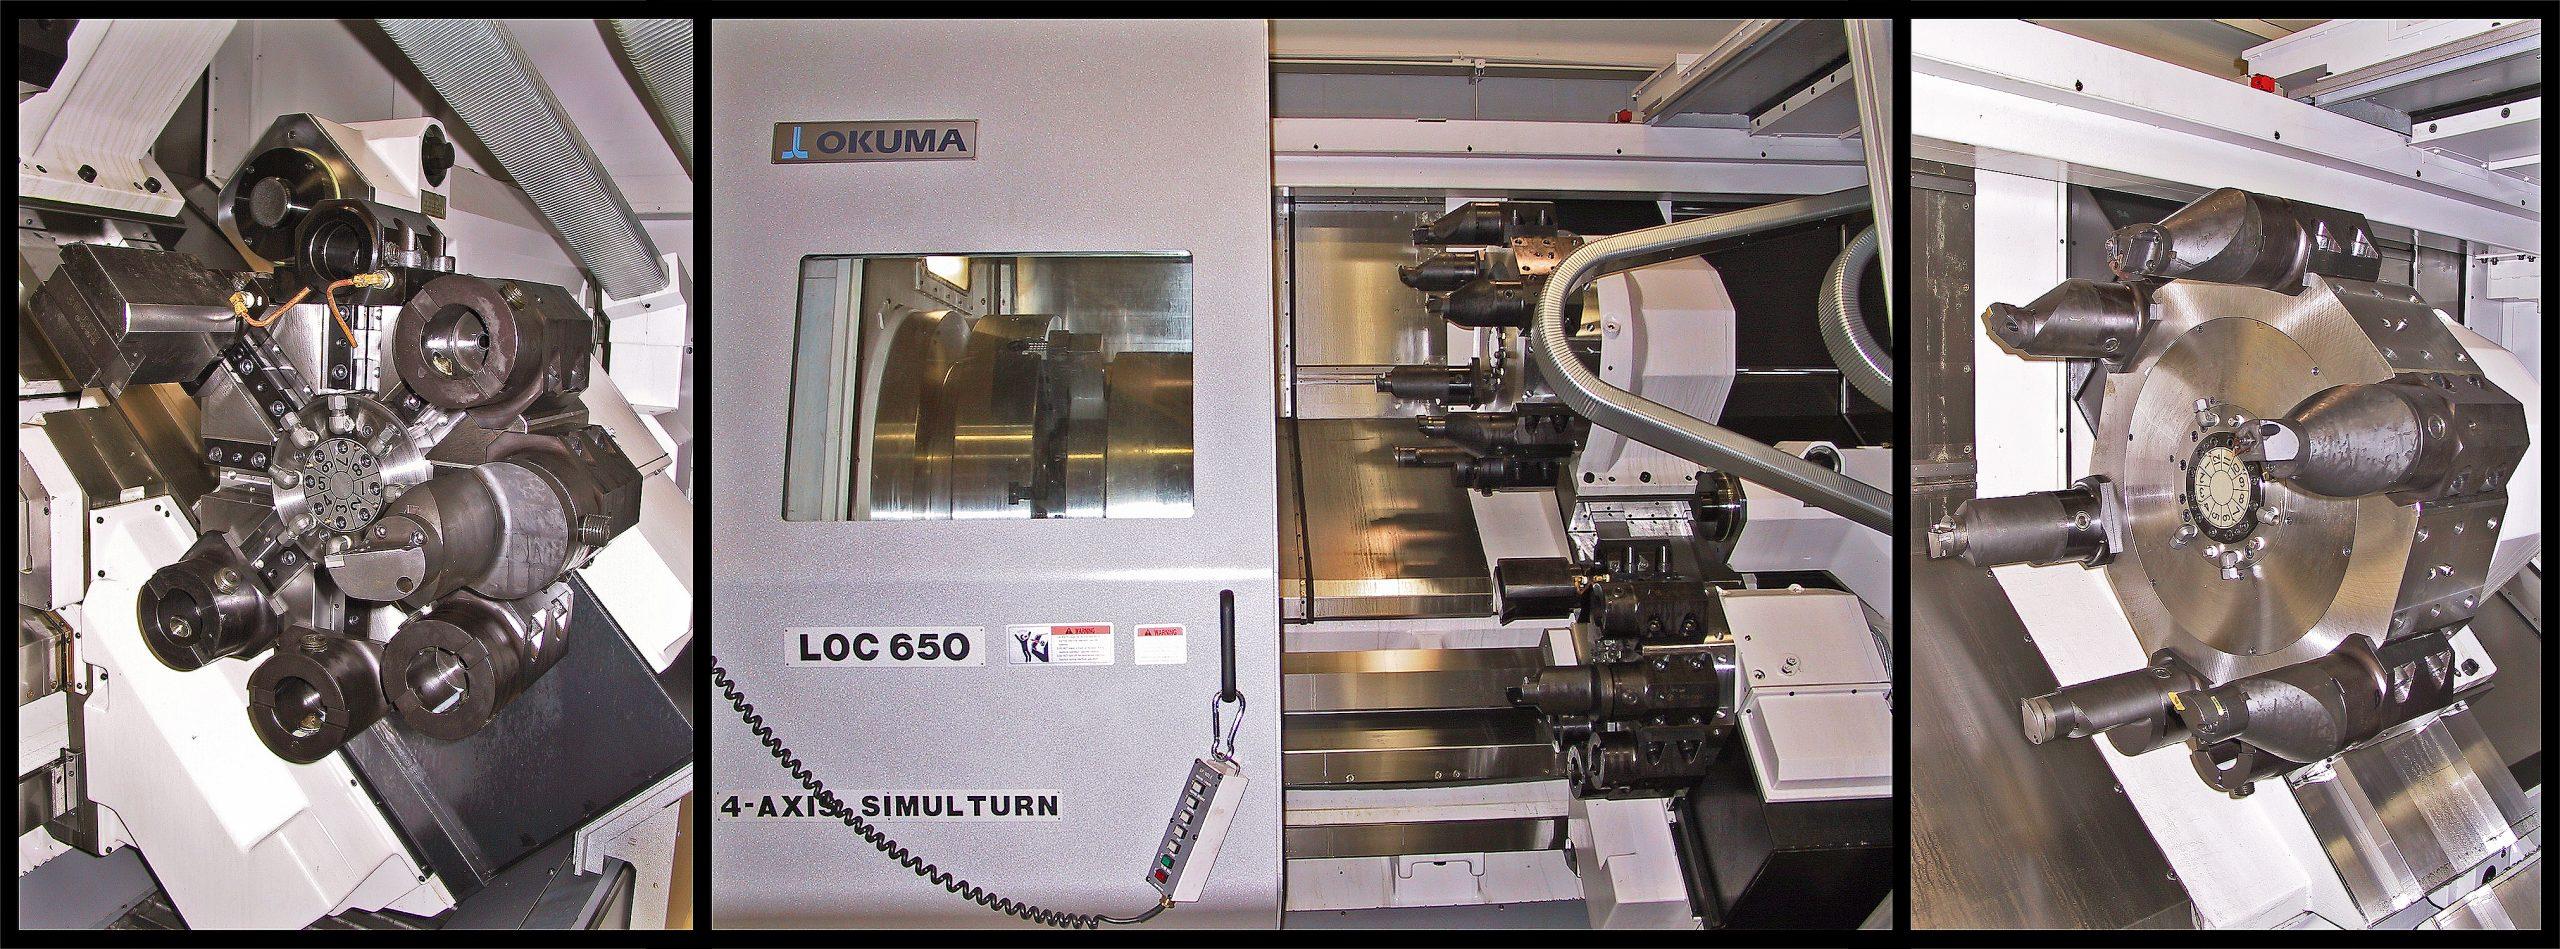 Okuma LOC 650 Quick change turret tooling